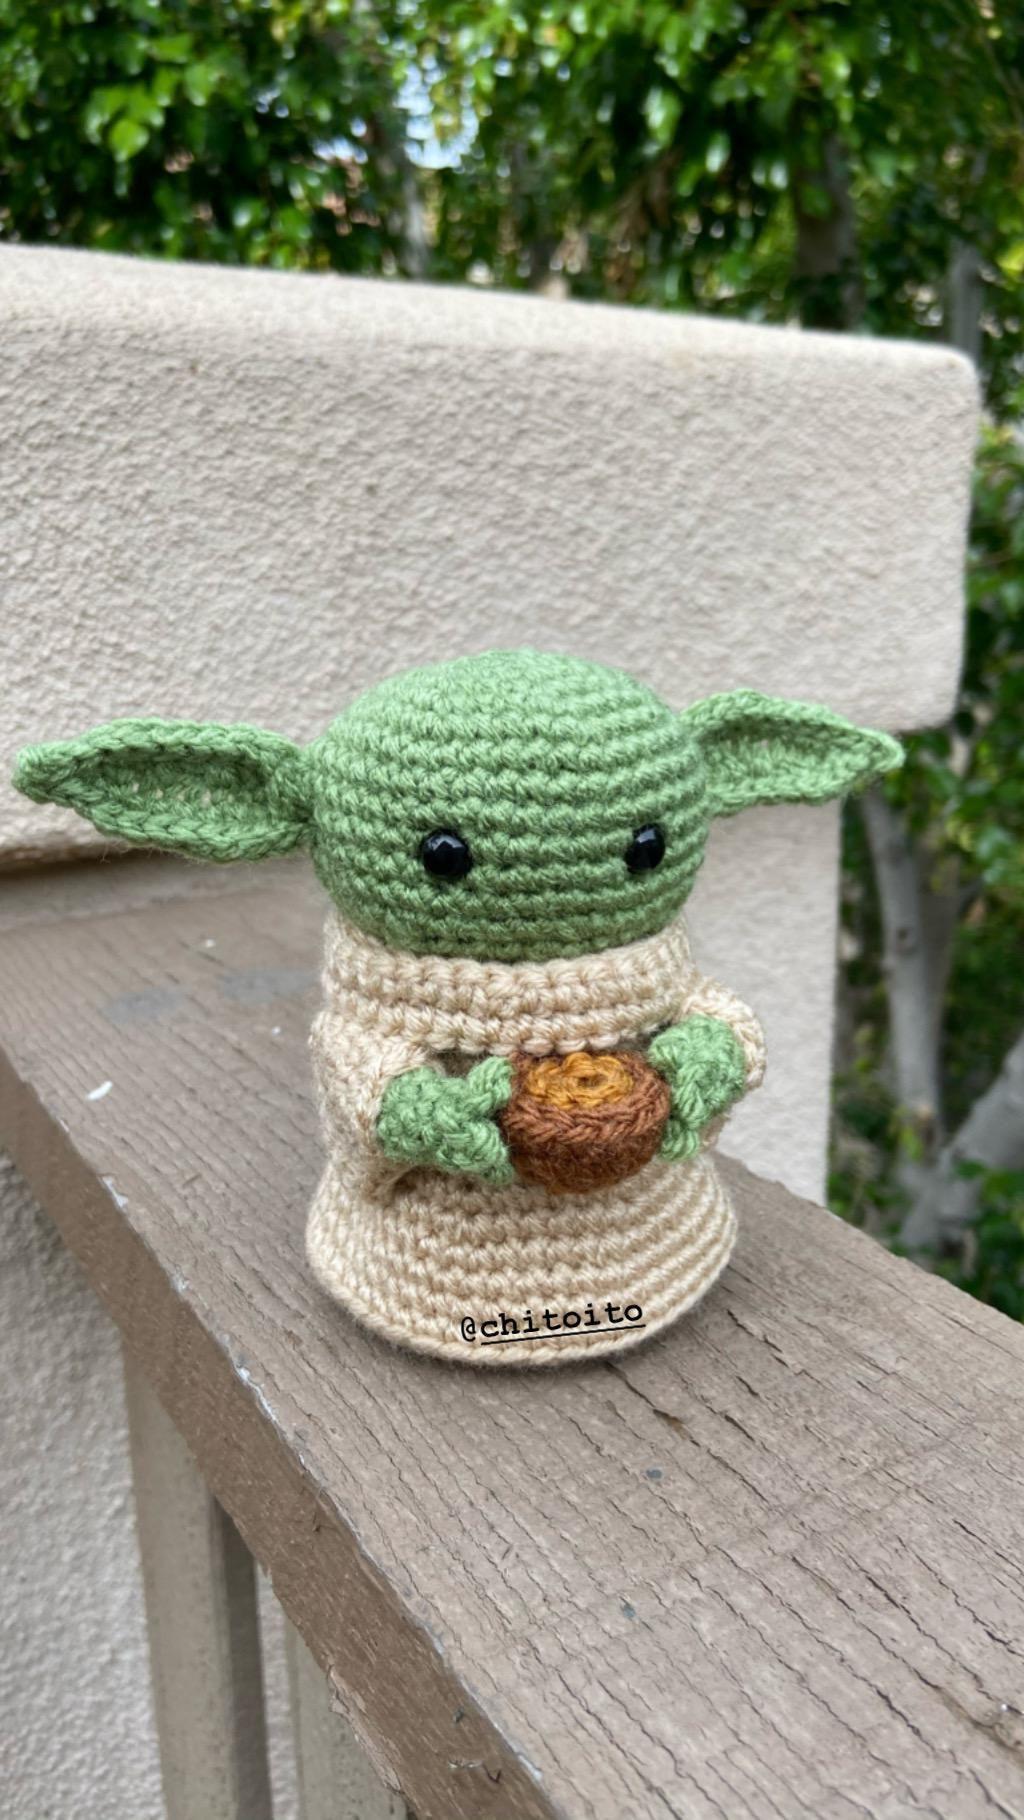 Baby Yoda Episode 4 By Christineito92 Crafts Creative Crochet Diy Handmade Crochet Yoda Yoda Images